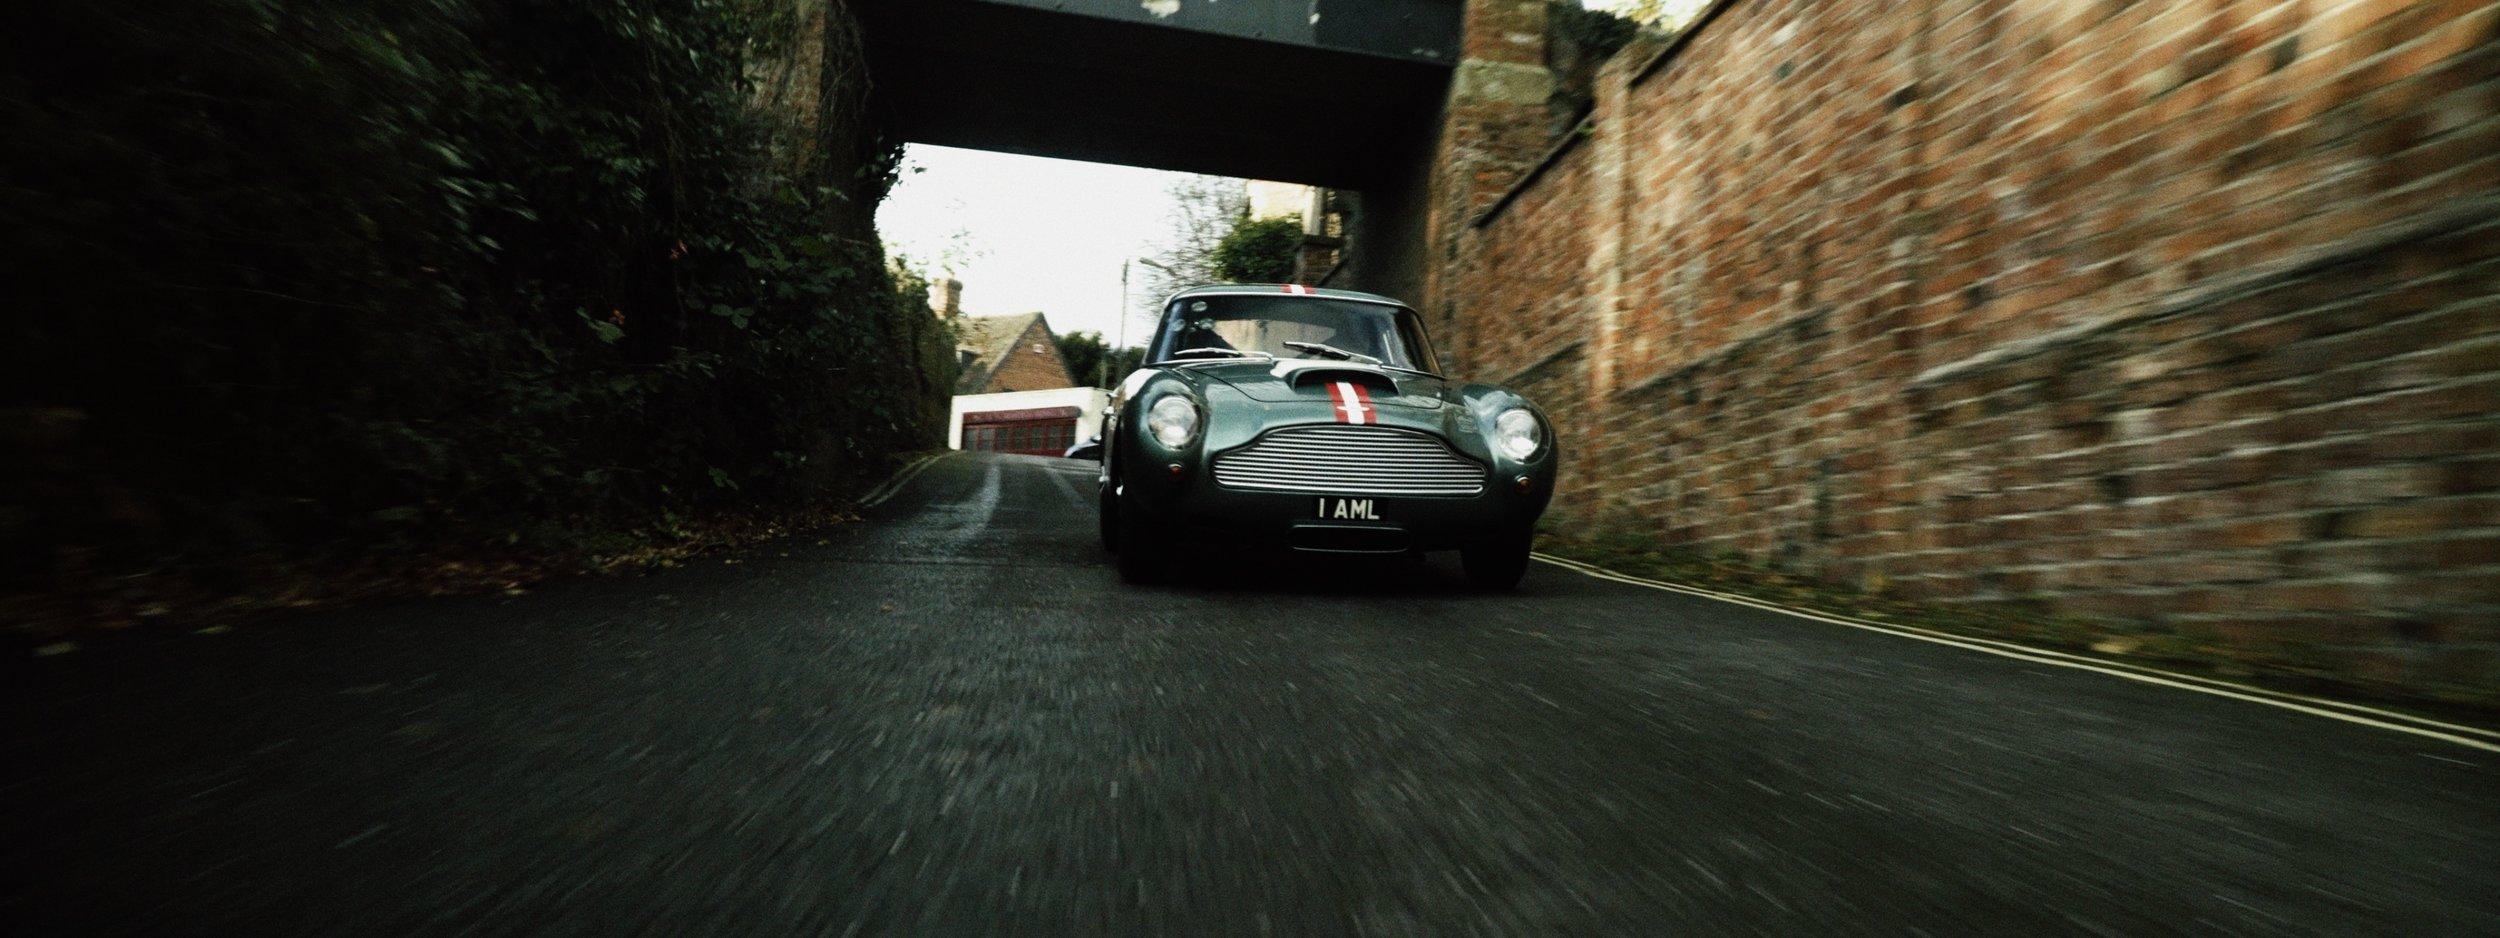 Aston DB4 frame 7.jpg